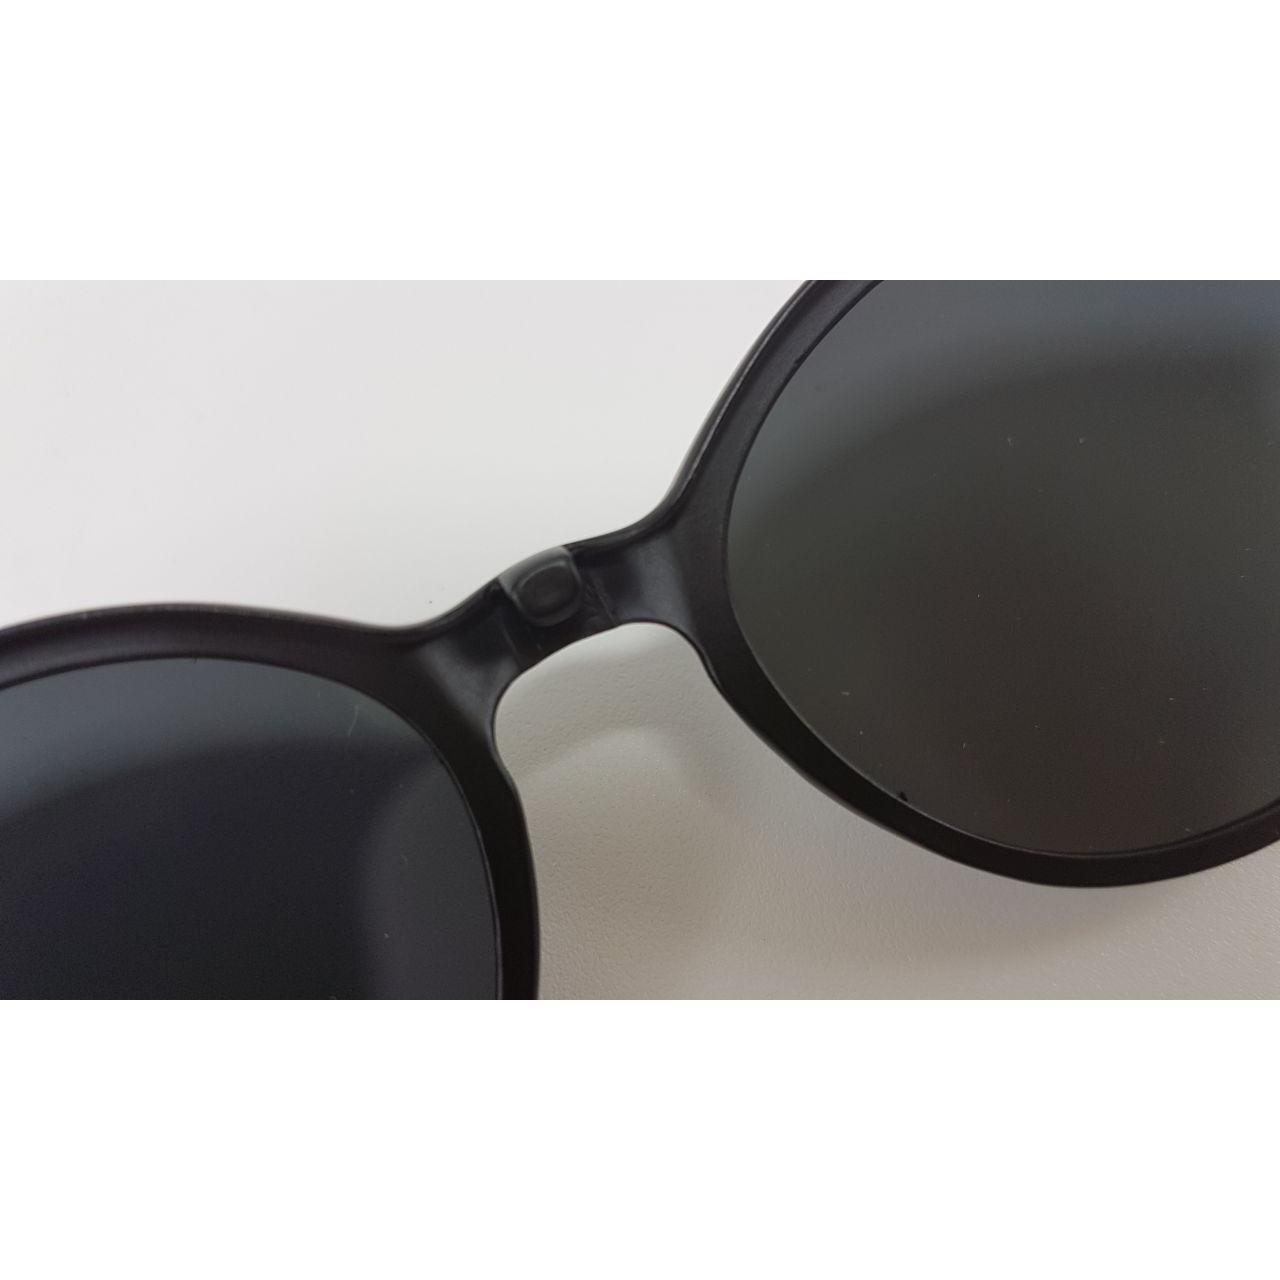 Frame Kacamata Minus Fashion Clip On 2223 Sunglasses Pria Wanita - 3 . b169d4cb91